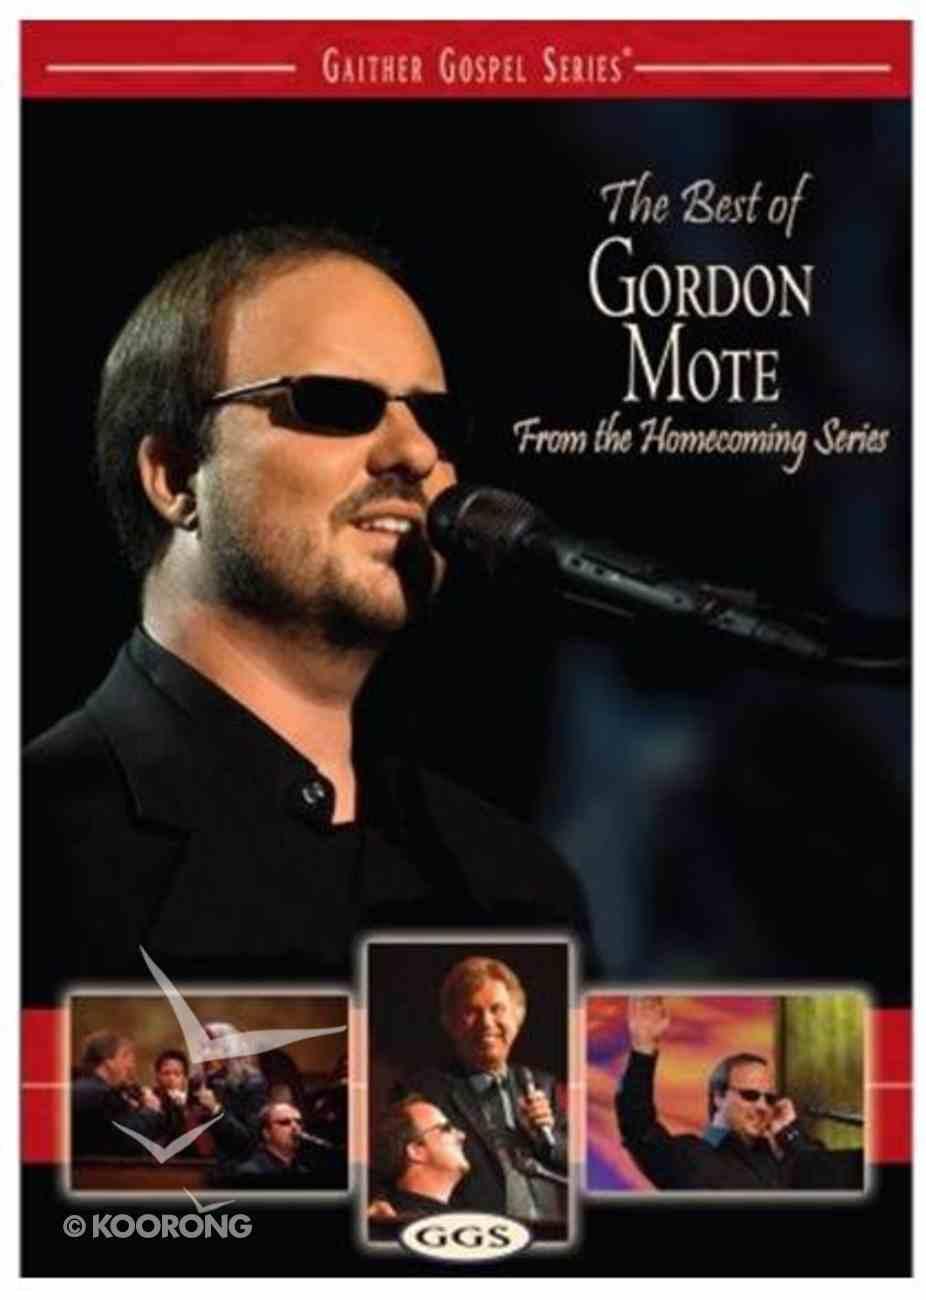 The Best of Gordon Mote (Gaither Gospel Series) DVD